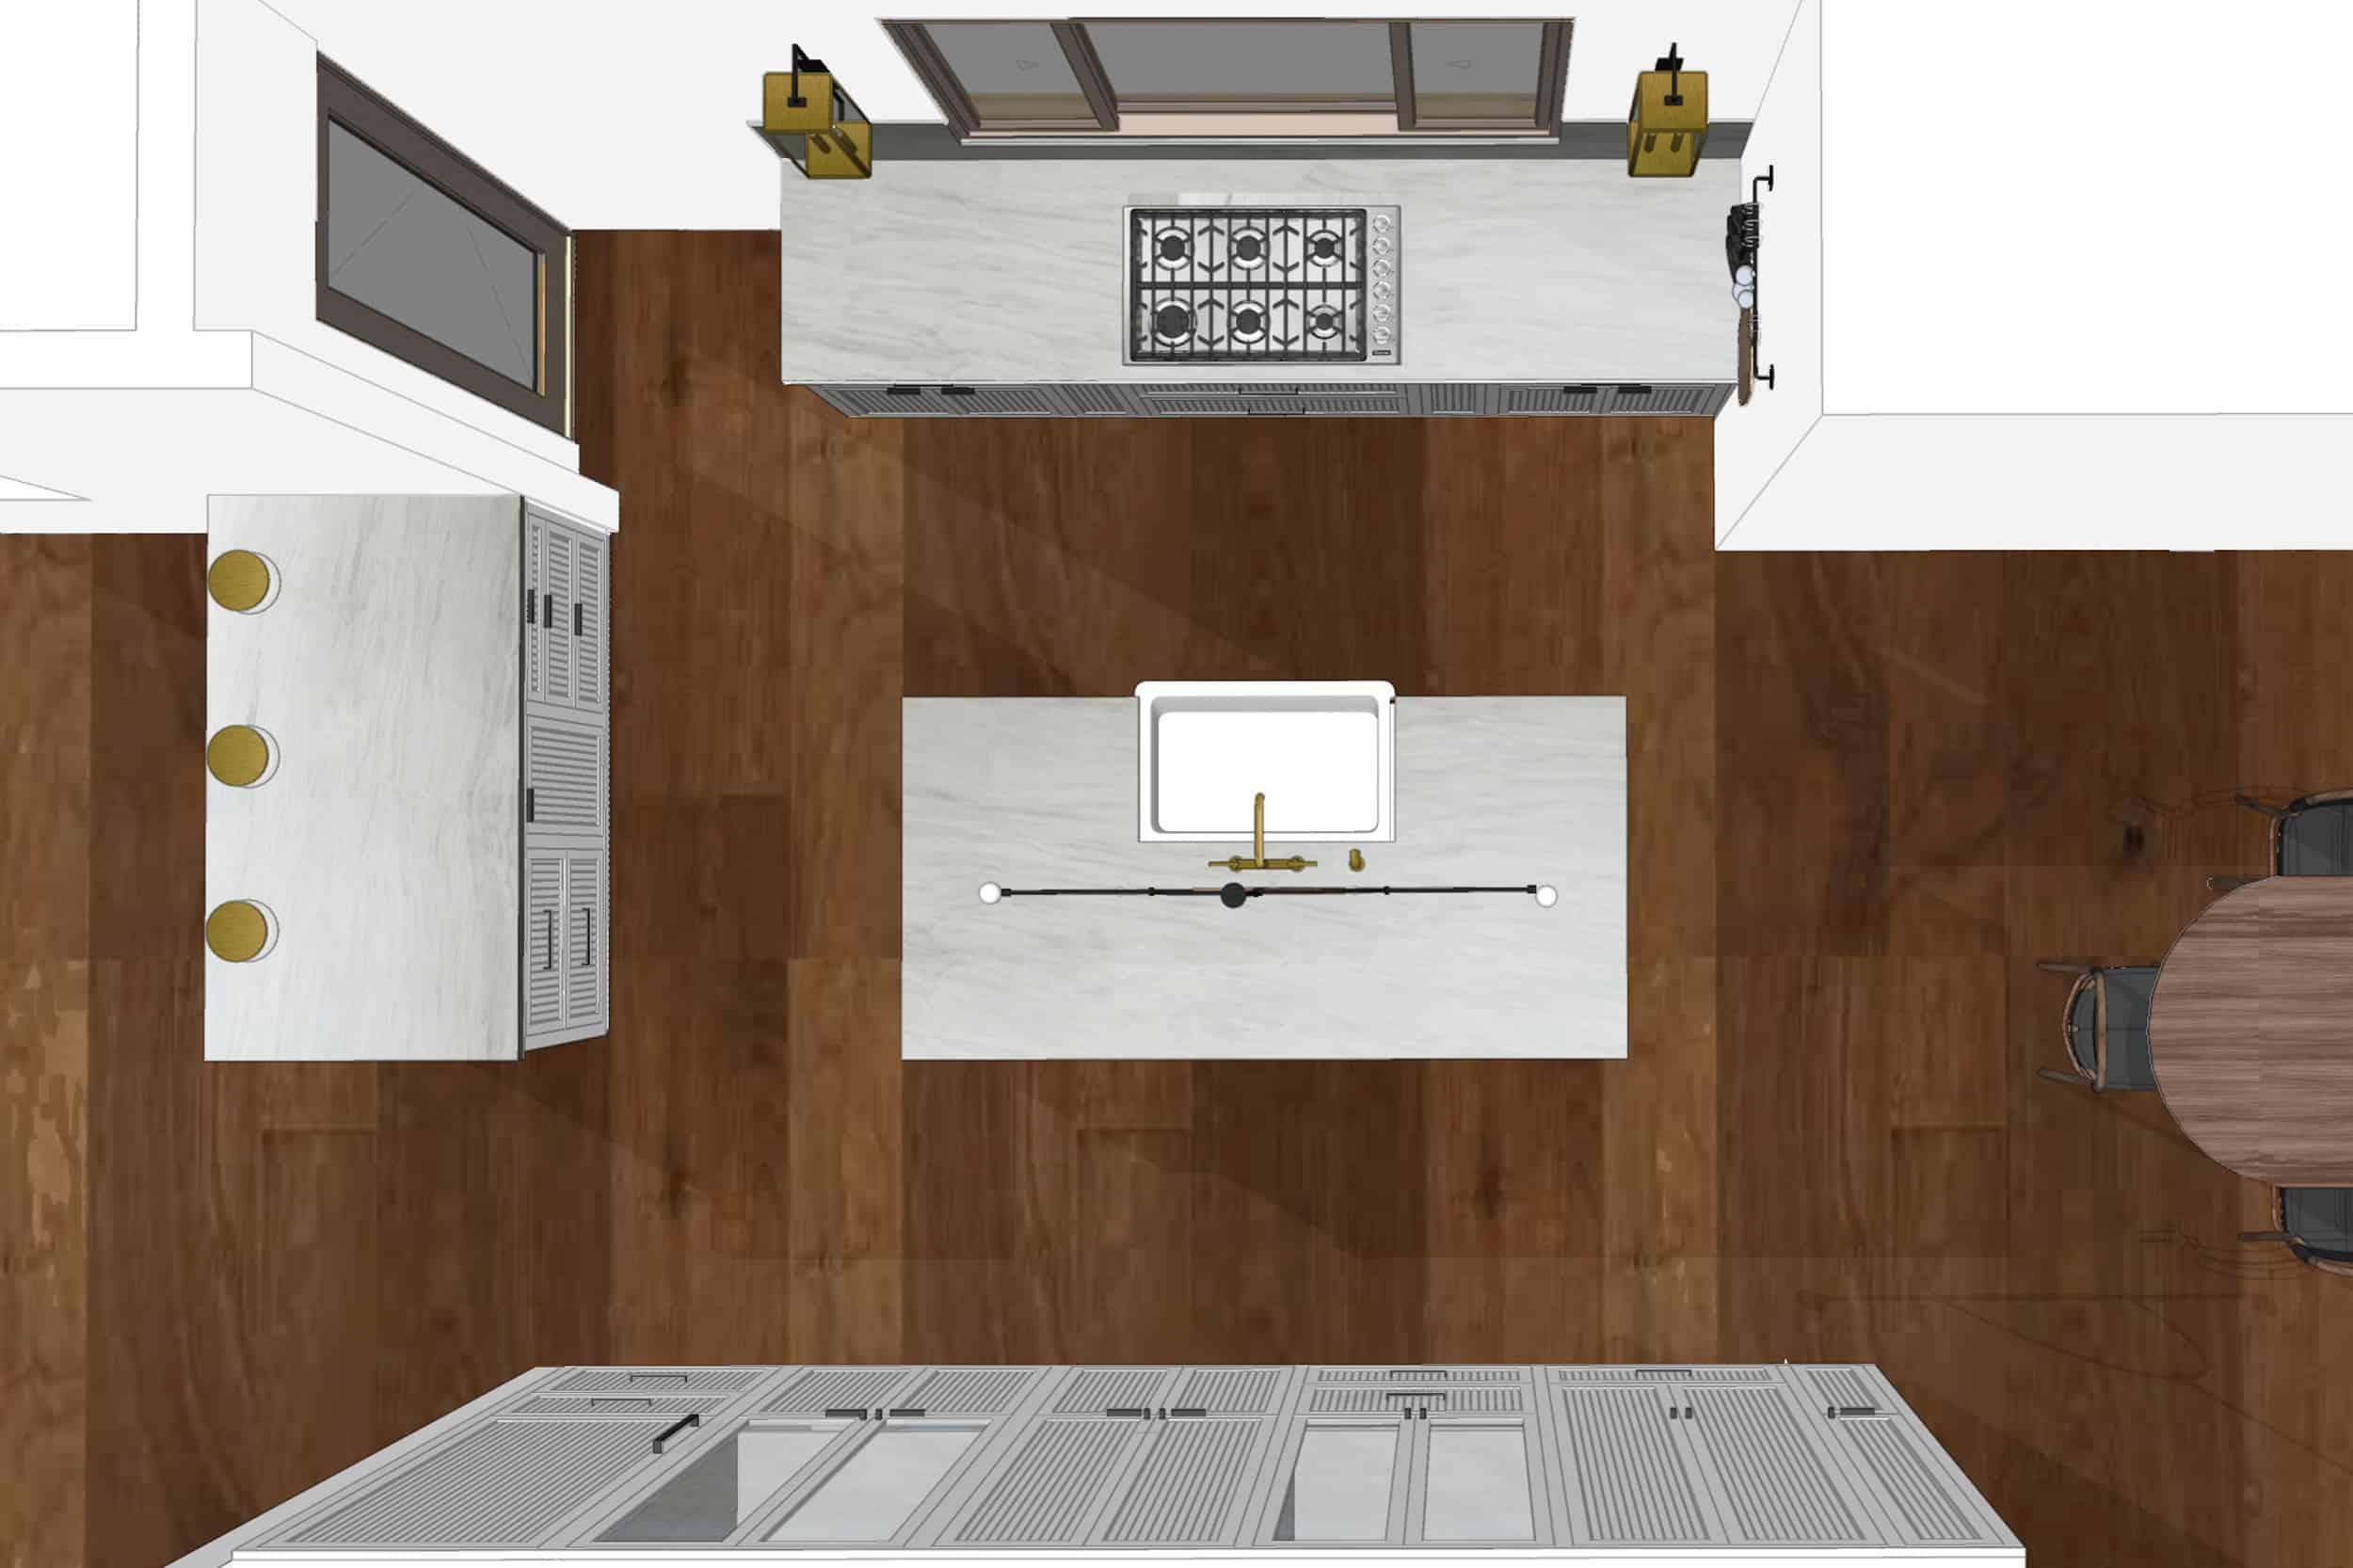 Emily Henderson Mountain Fixer Upper I Design You Decide Kitchen Render Plan Fnladjd2